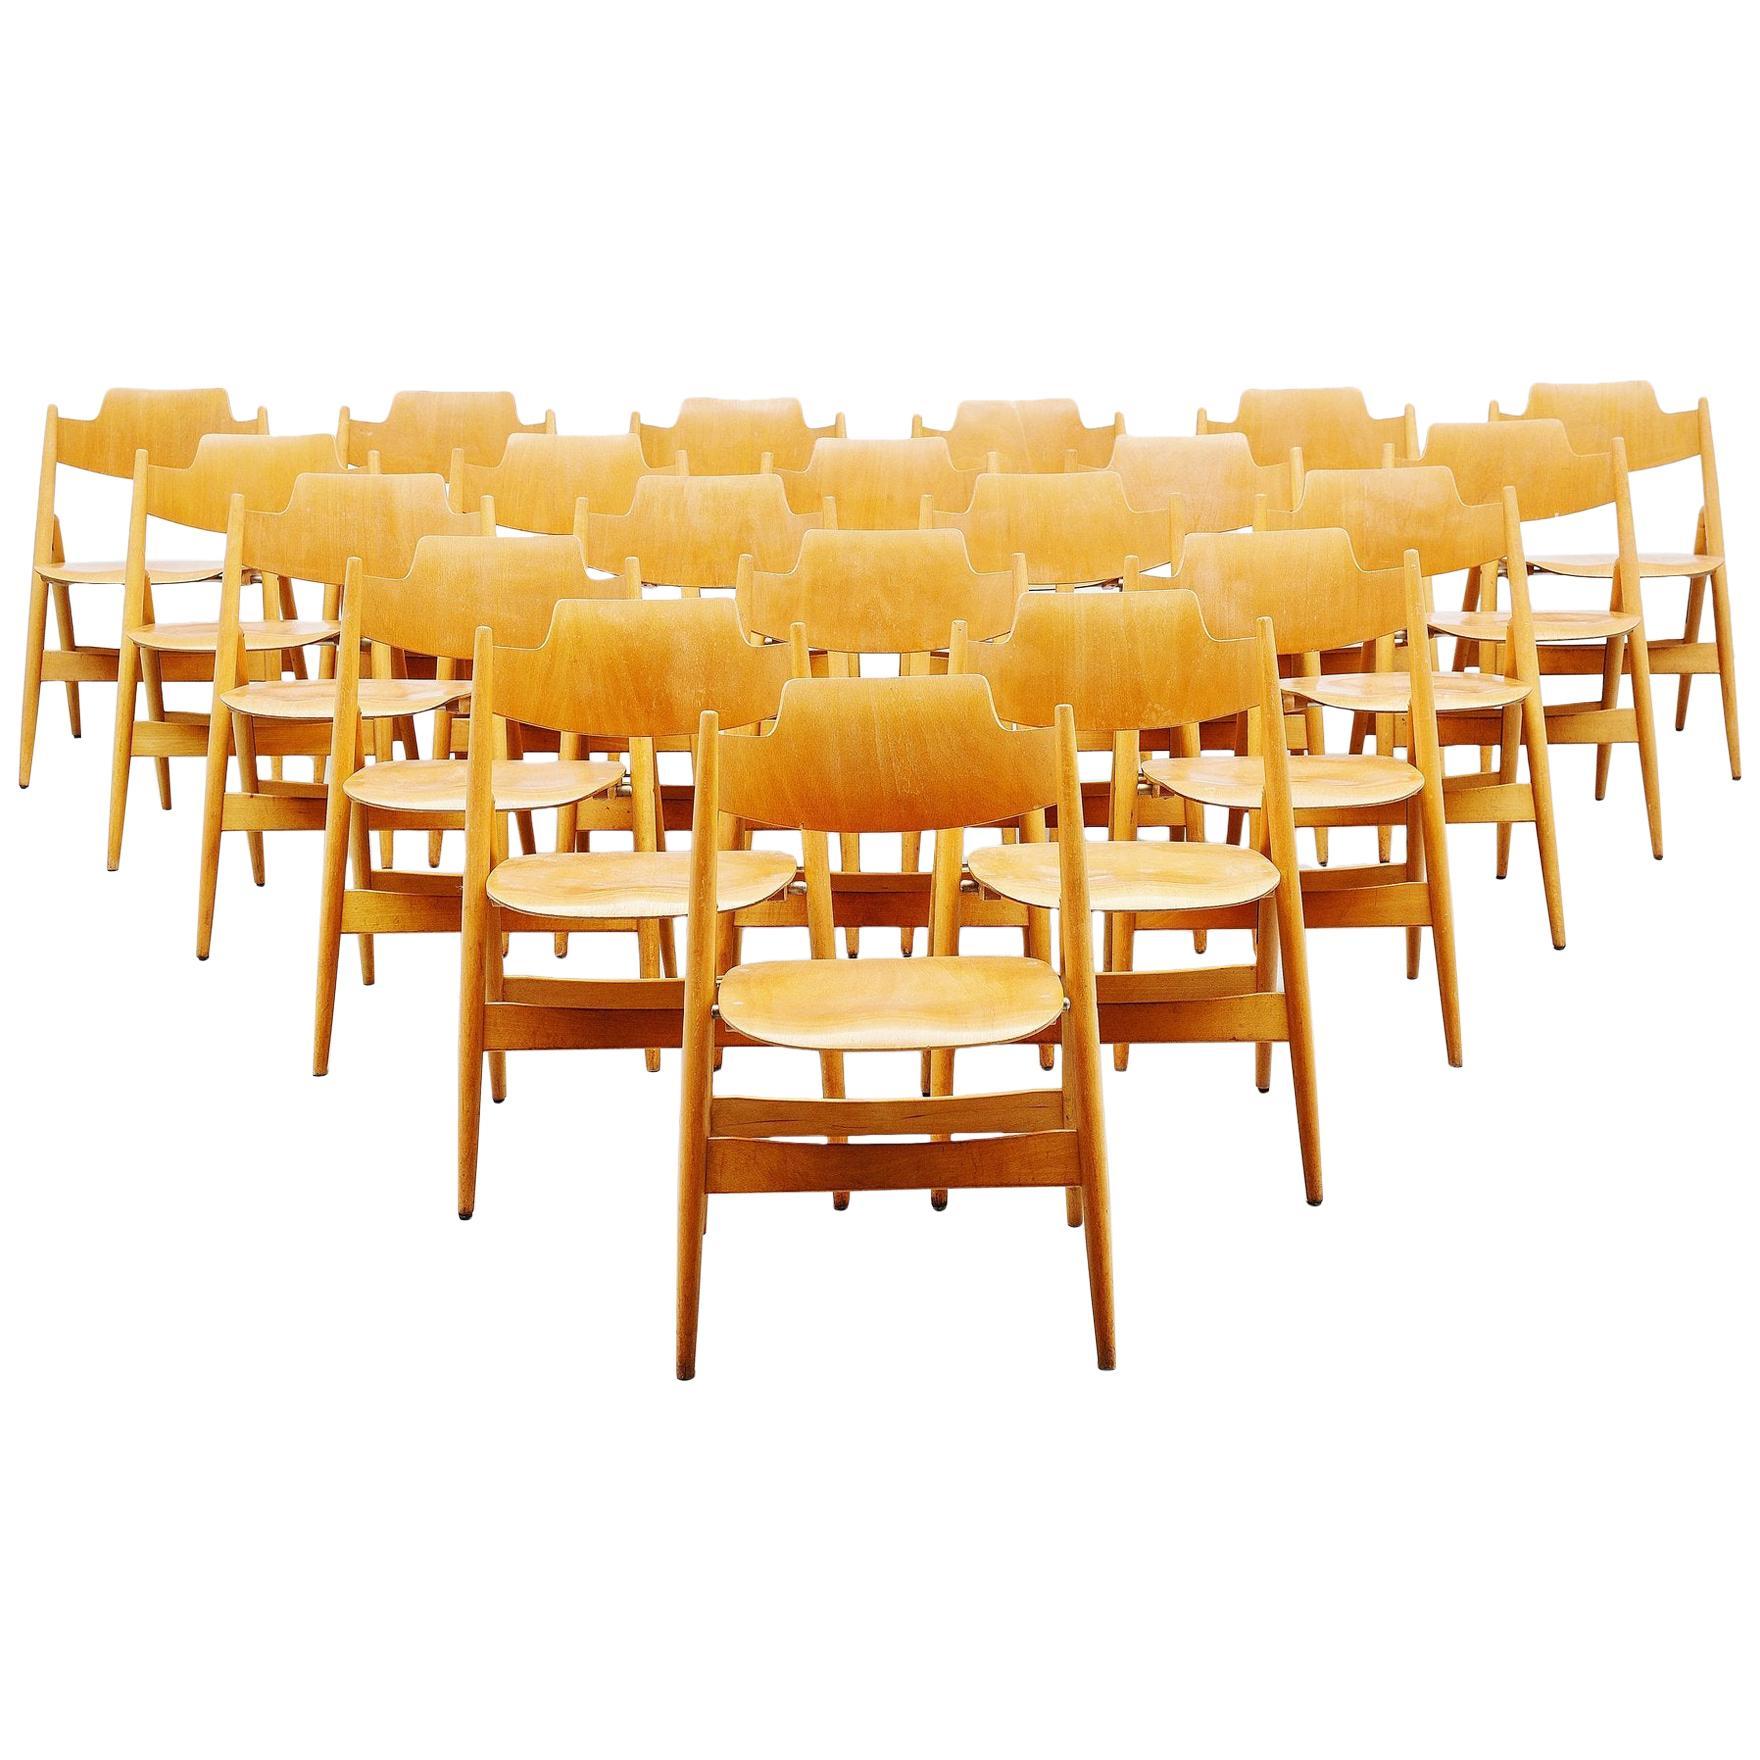 Egon Eiermann SE18 Folding Chairs Wilde & Spieth, 1952